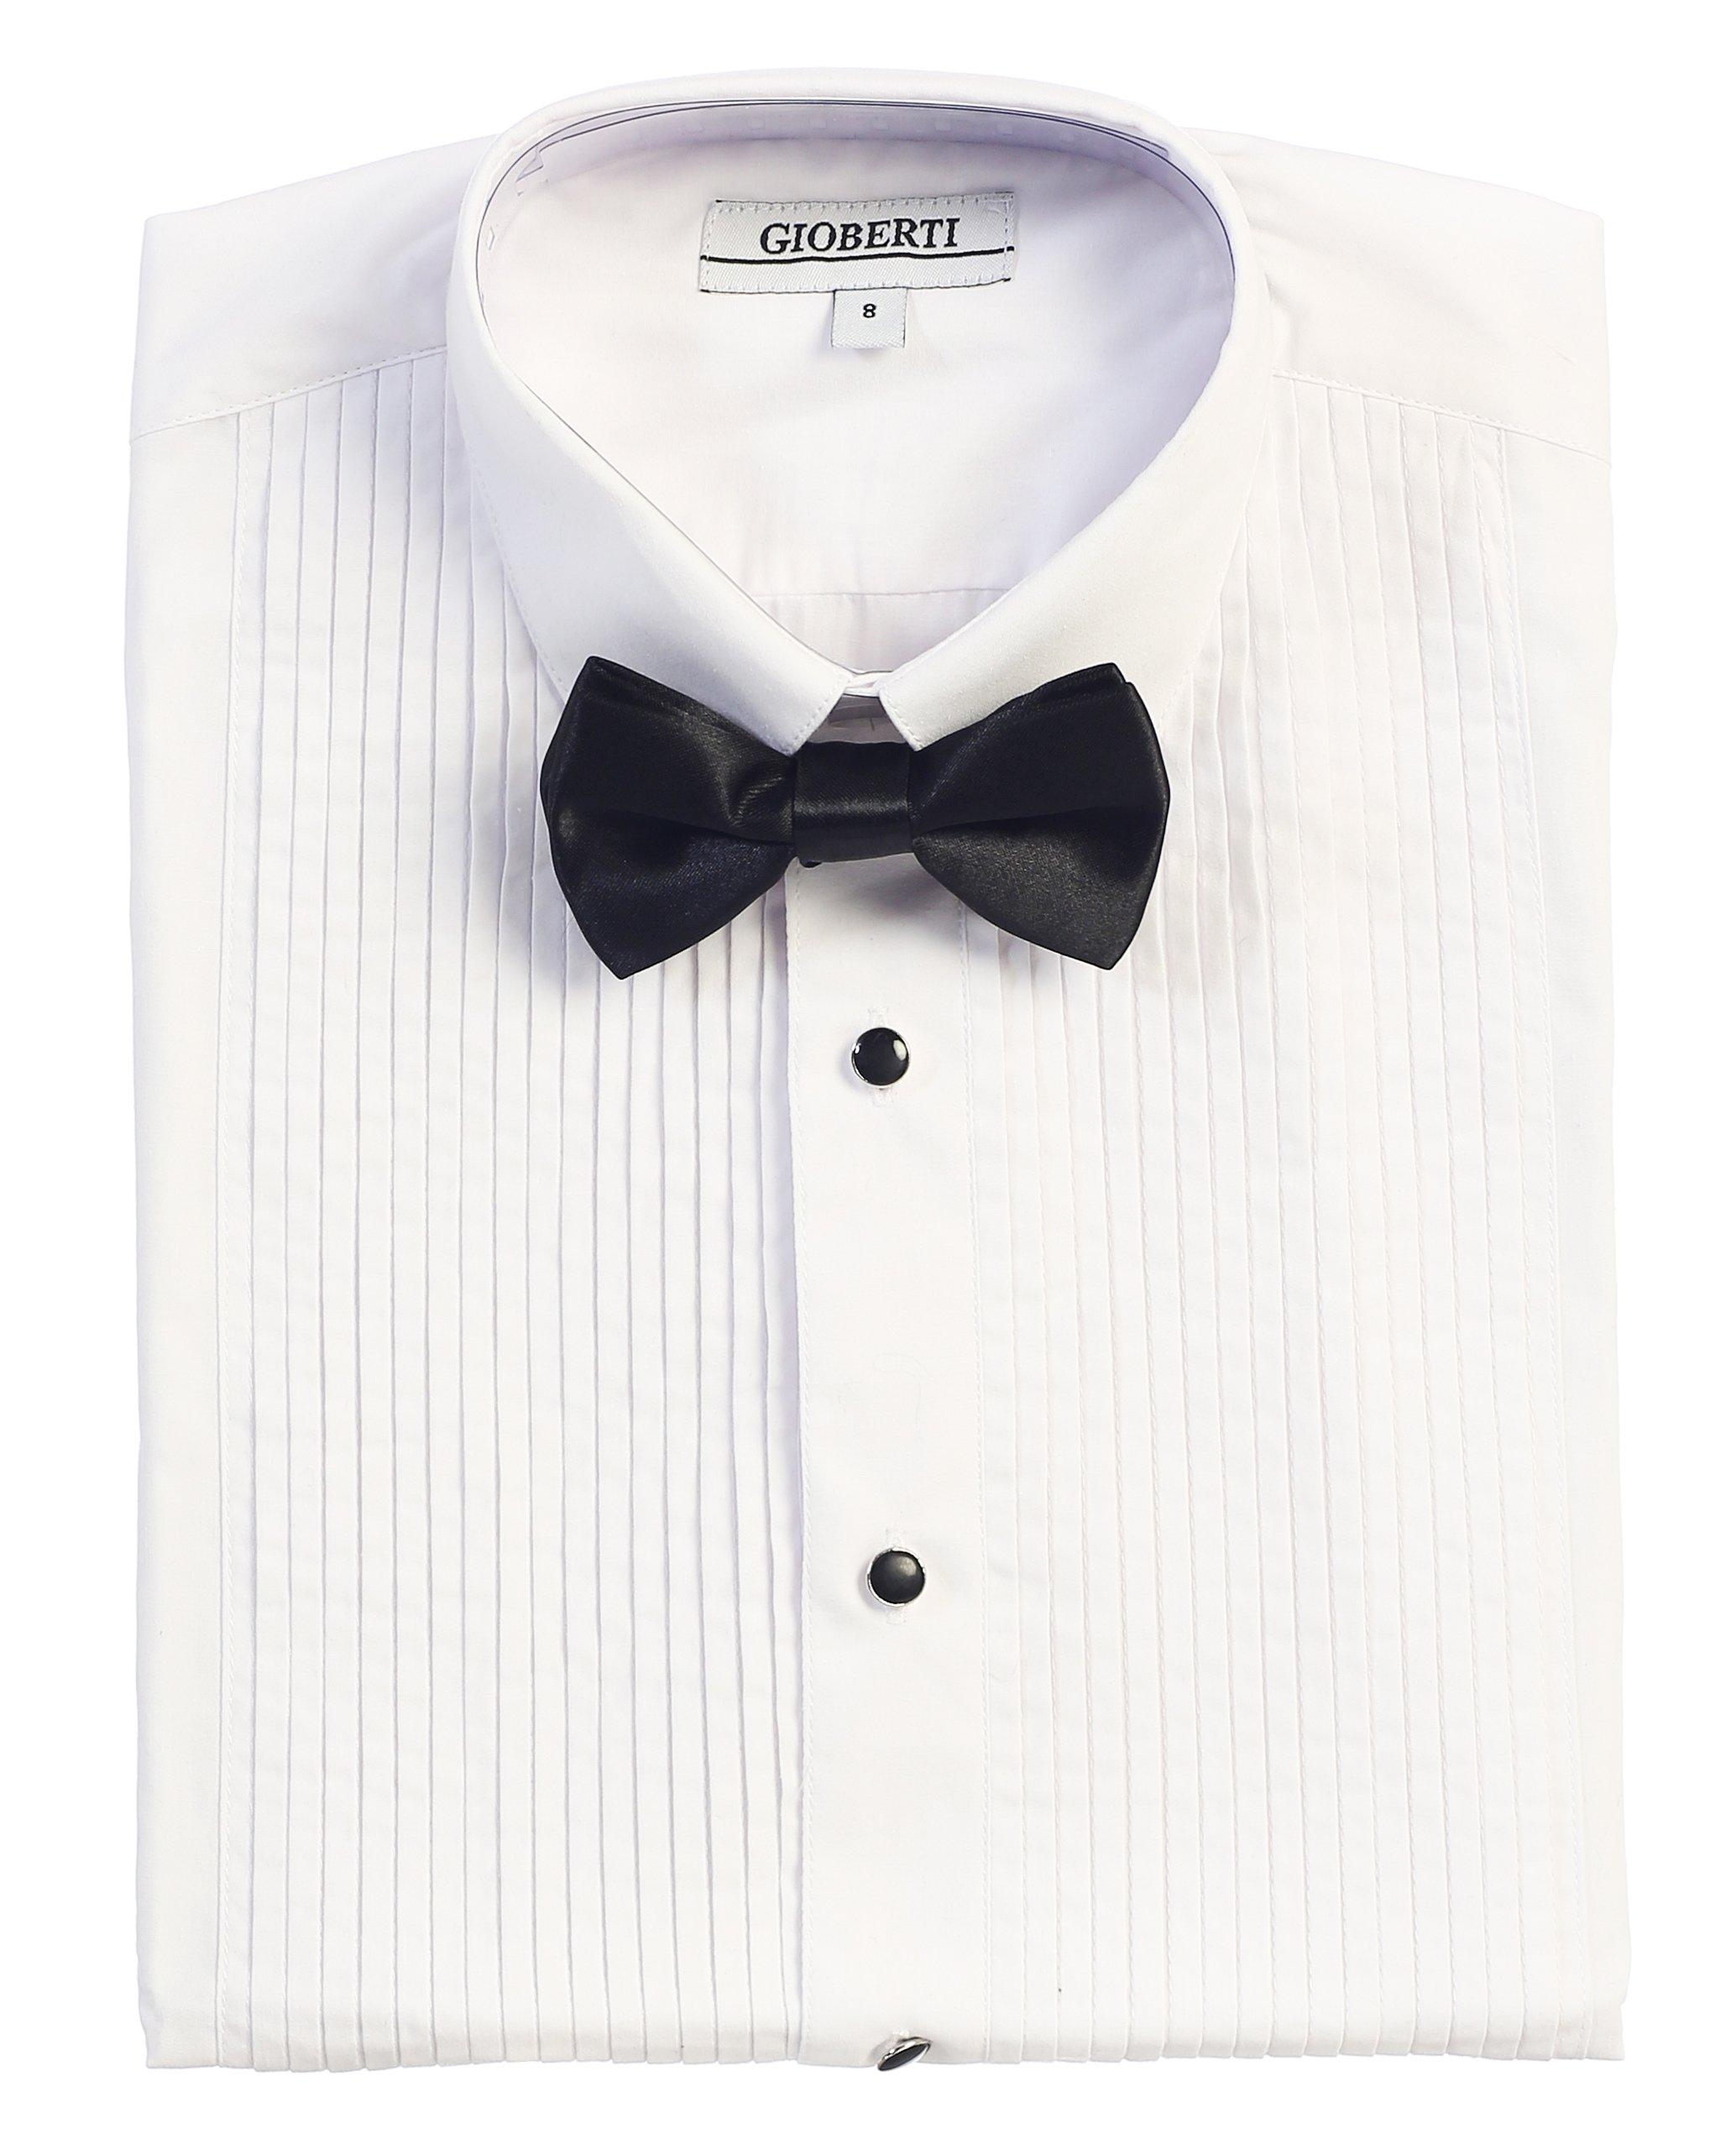 Gioberti Boy's Tuxedo Dress Shirt with Bow Tie, White, Size 5